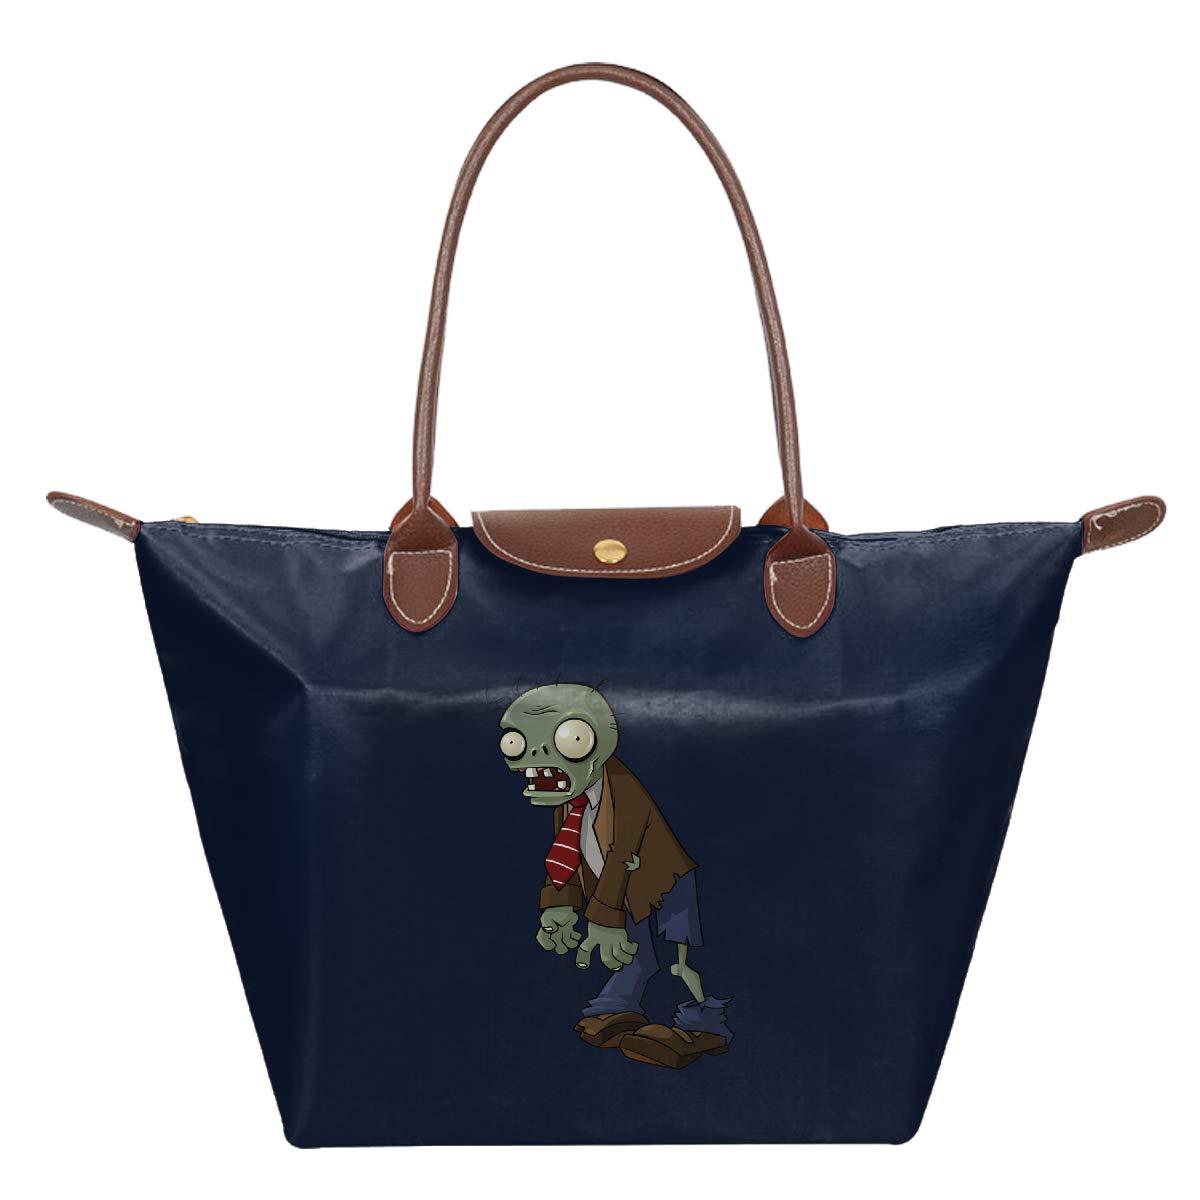 Zombies Waterproof Leather Folded Messenger Nylon Bag Travel Tote Hopping Folding School Handbags Plants Vs